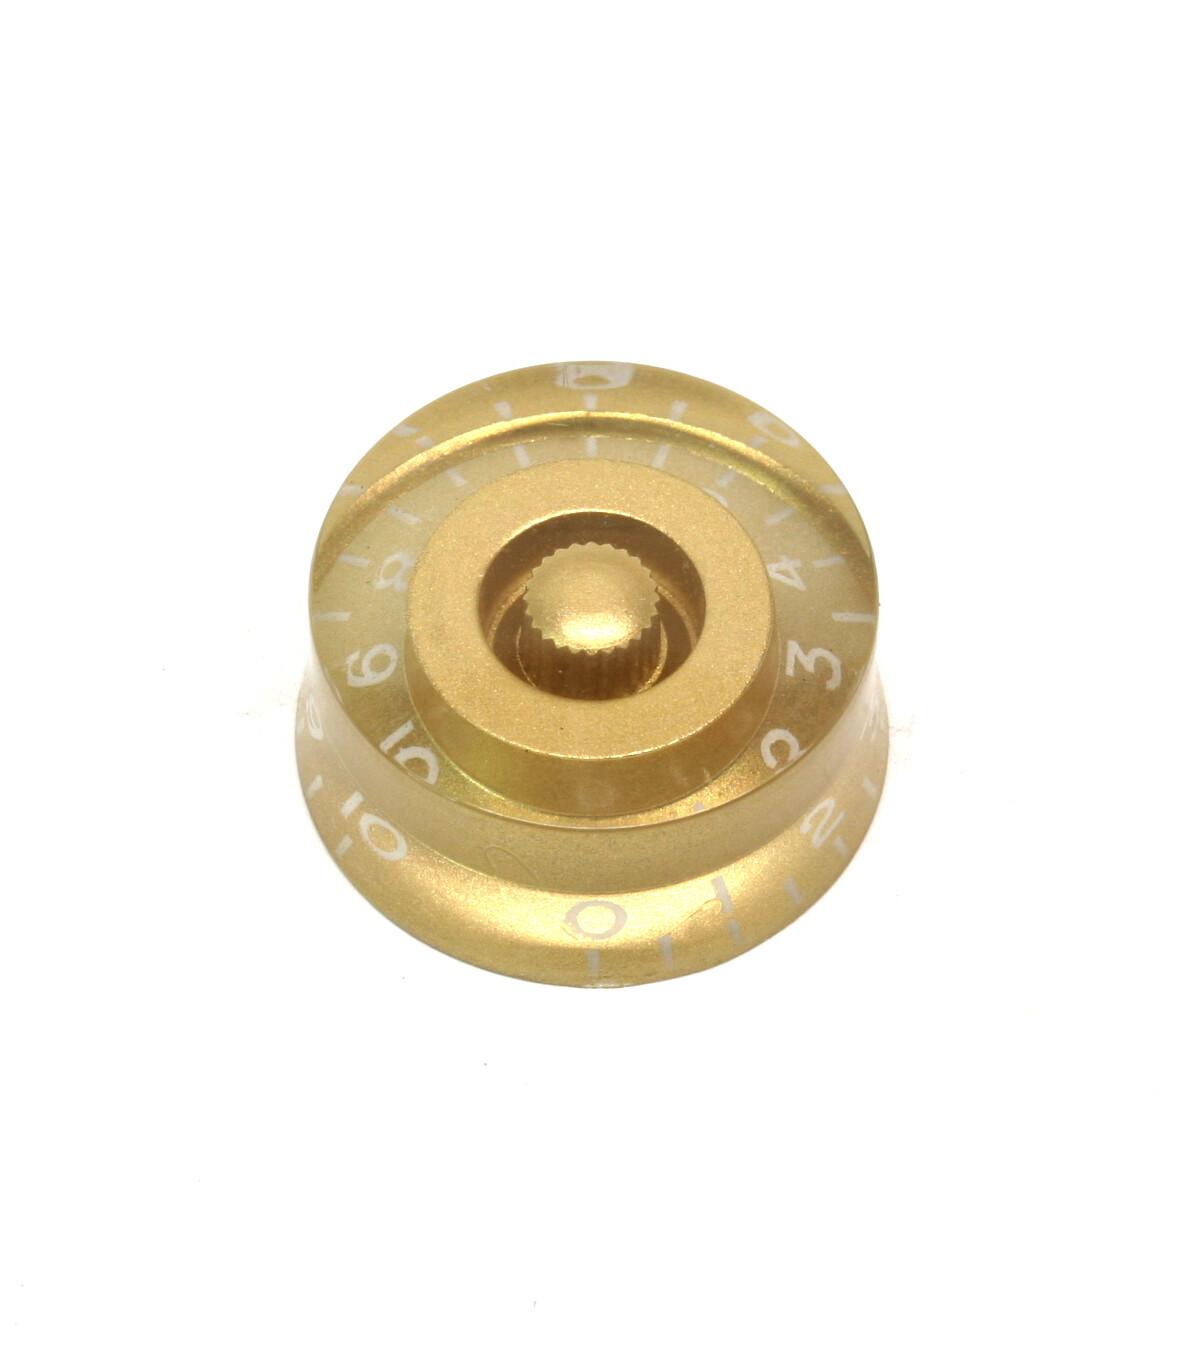 Light Gold Speed knobs vintage style numbers, fits USA split shaft pots.